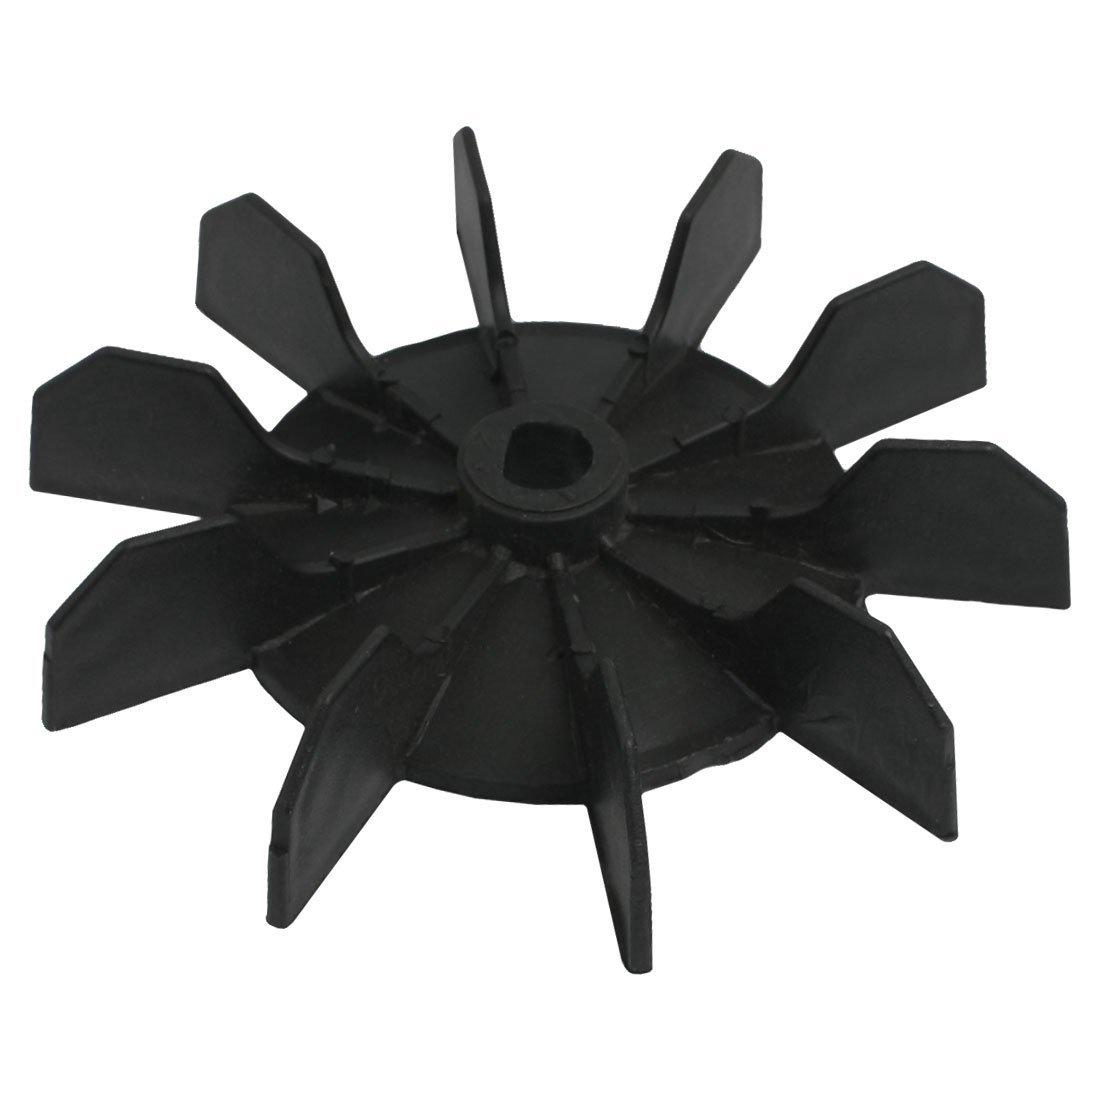 Sonline Replacement 0.5'' Inner Bore 10 Impeller Air Compressor Motor Fan Blade Black